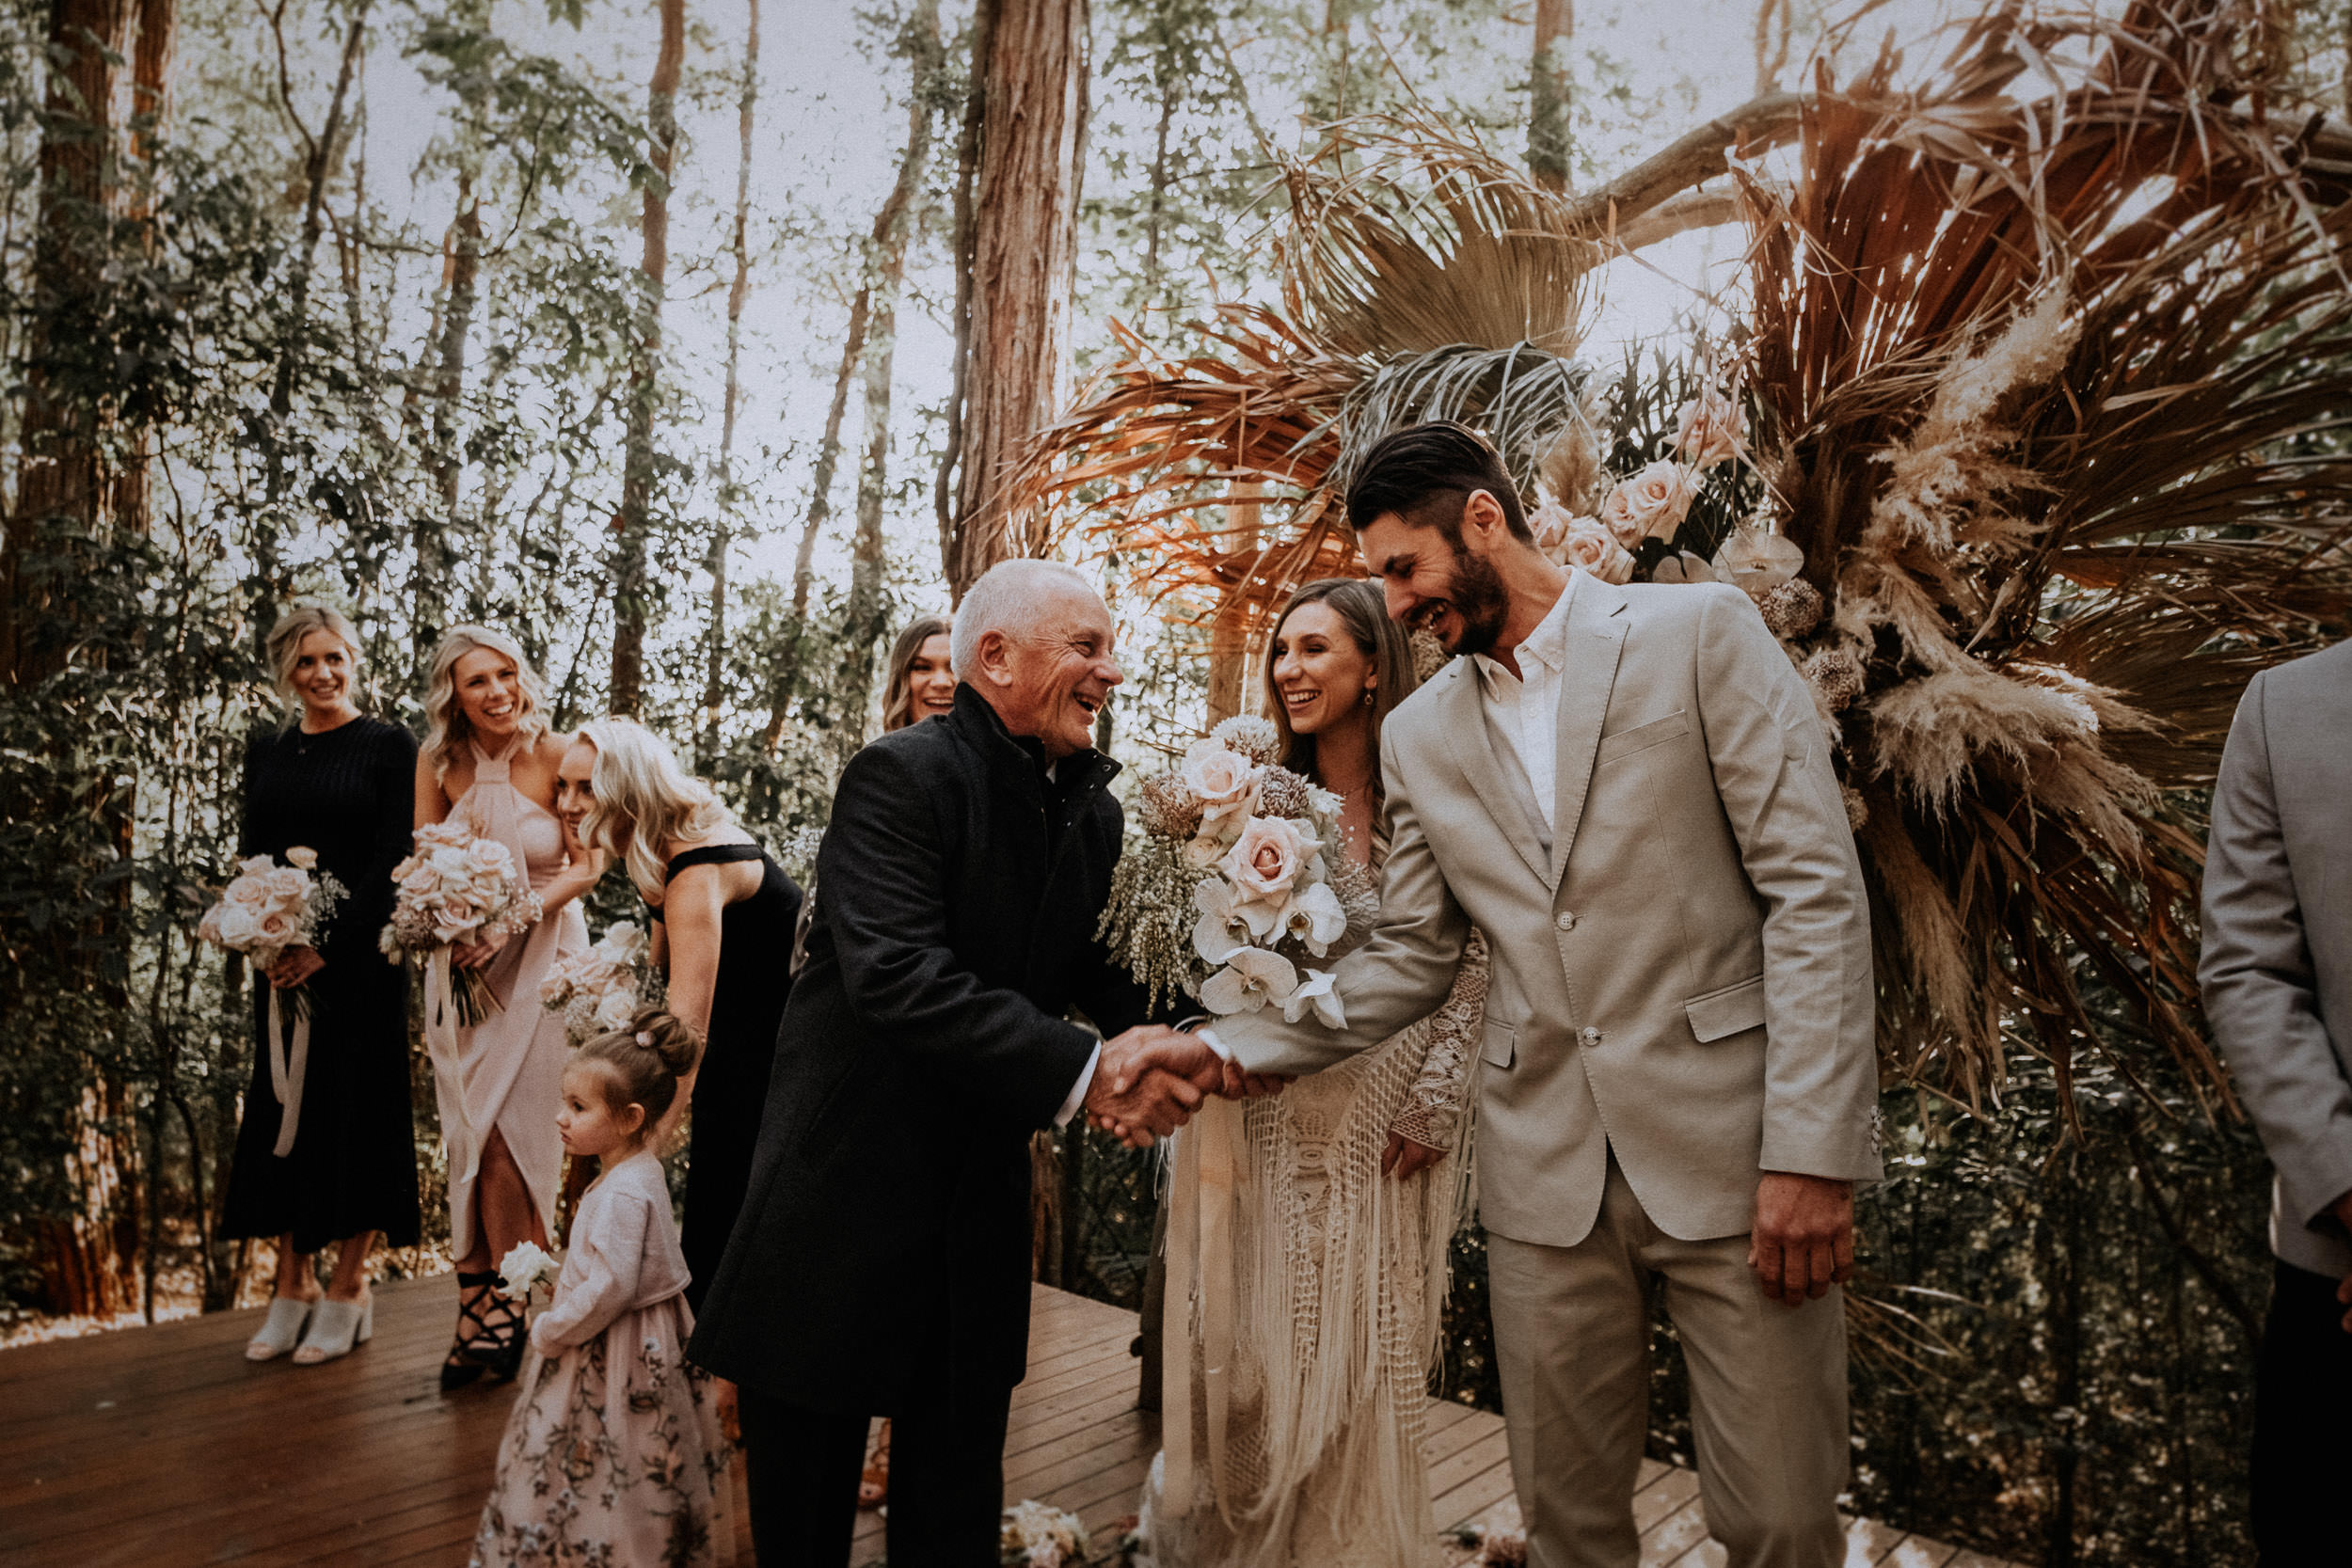 S&A Elopement - Kings & Thieves - Shred 'Til Dead - Central Coast Beach Forest Wedding - 174.jpg